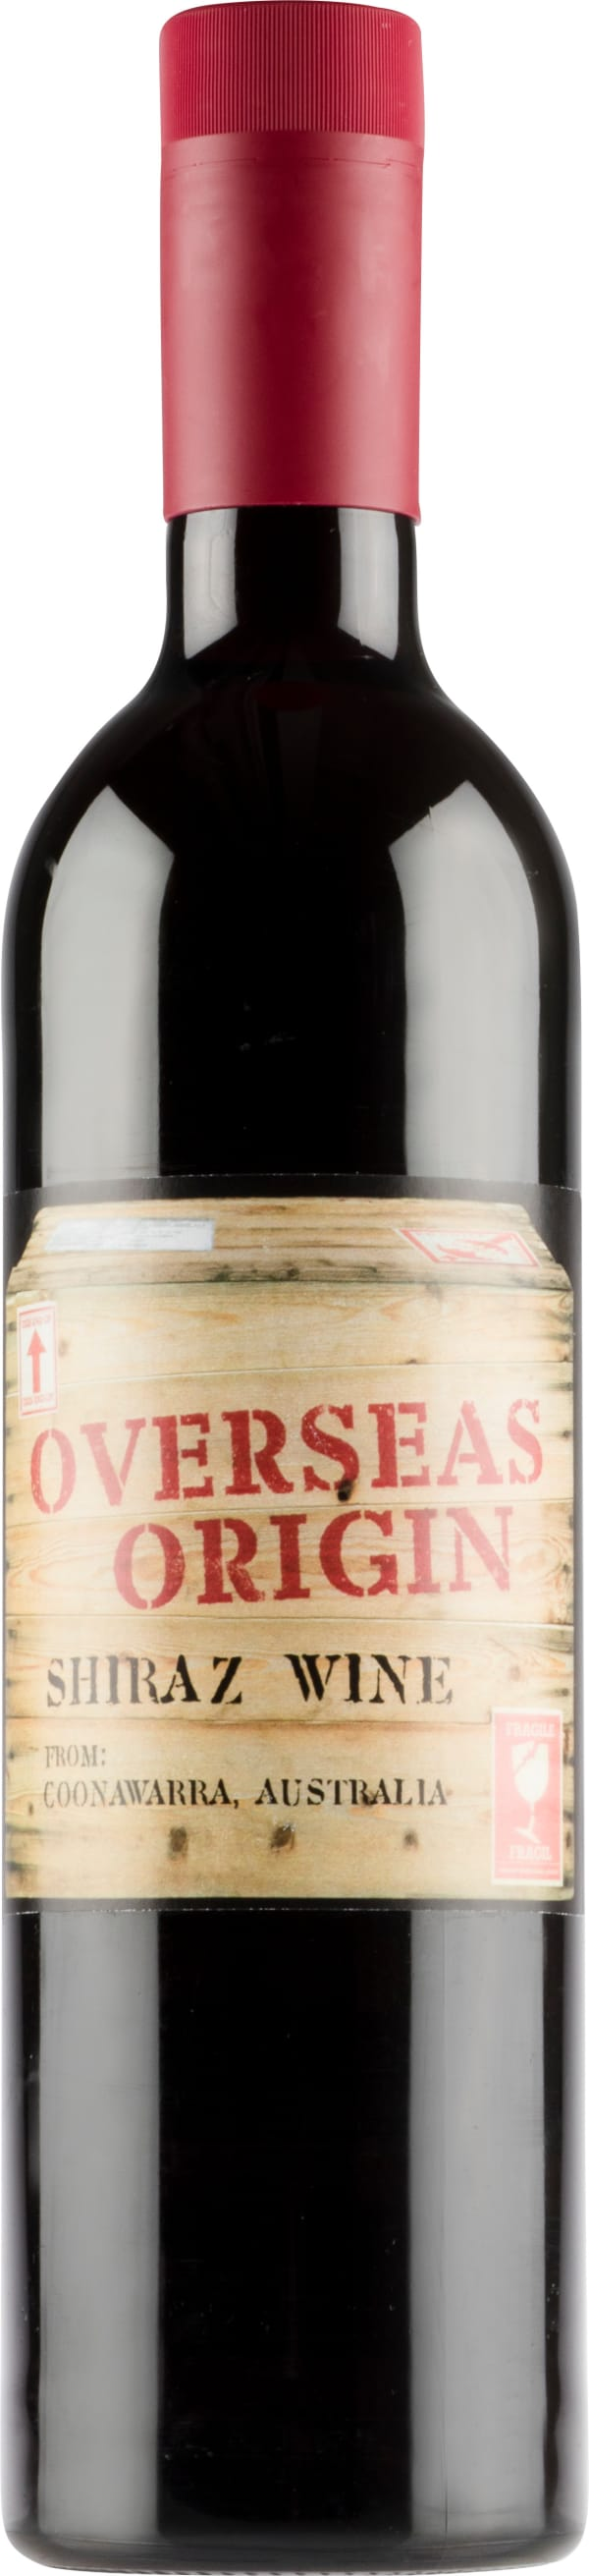 Overseas Origin Shiraz 2018 plastflaska